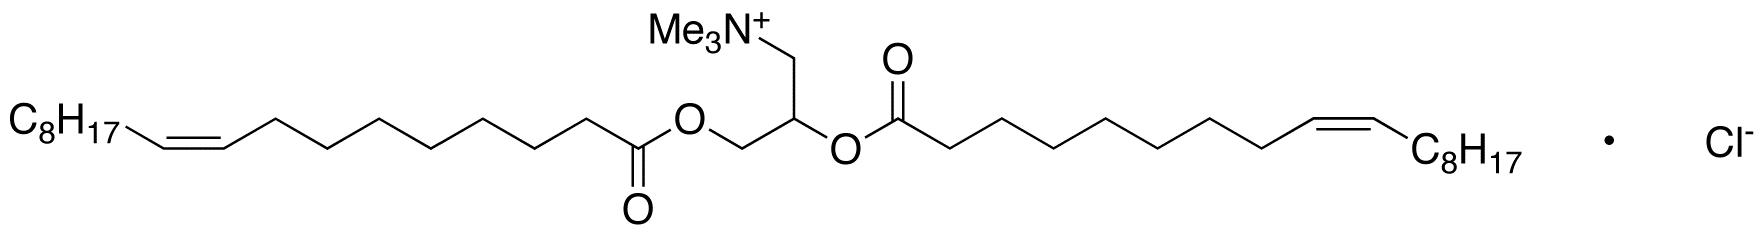 1,2-Dioleoyl-3-trimethylammonium-propane, Chloride